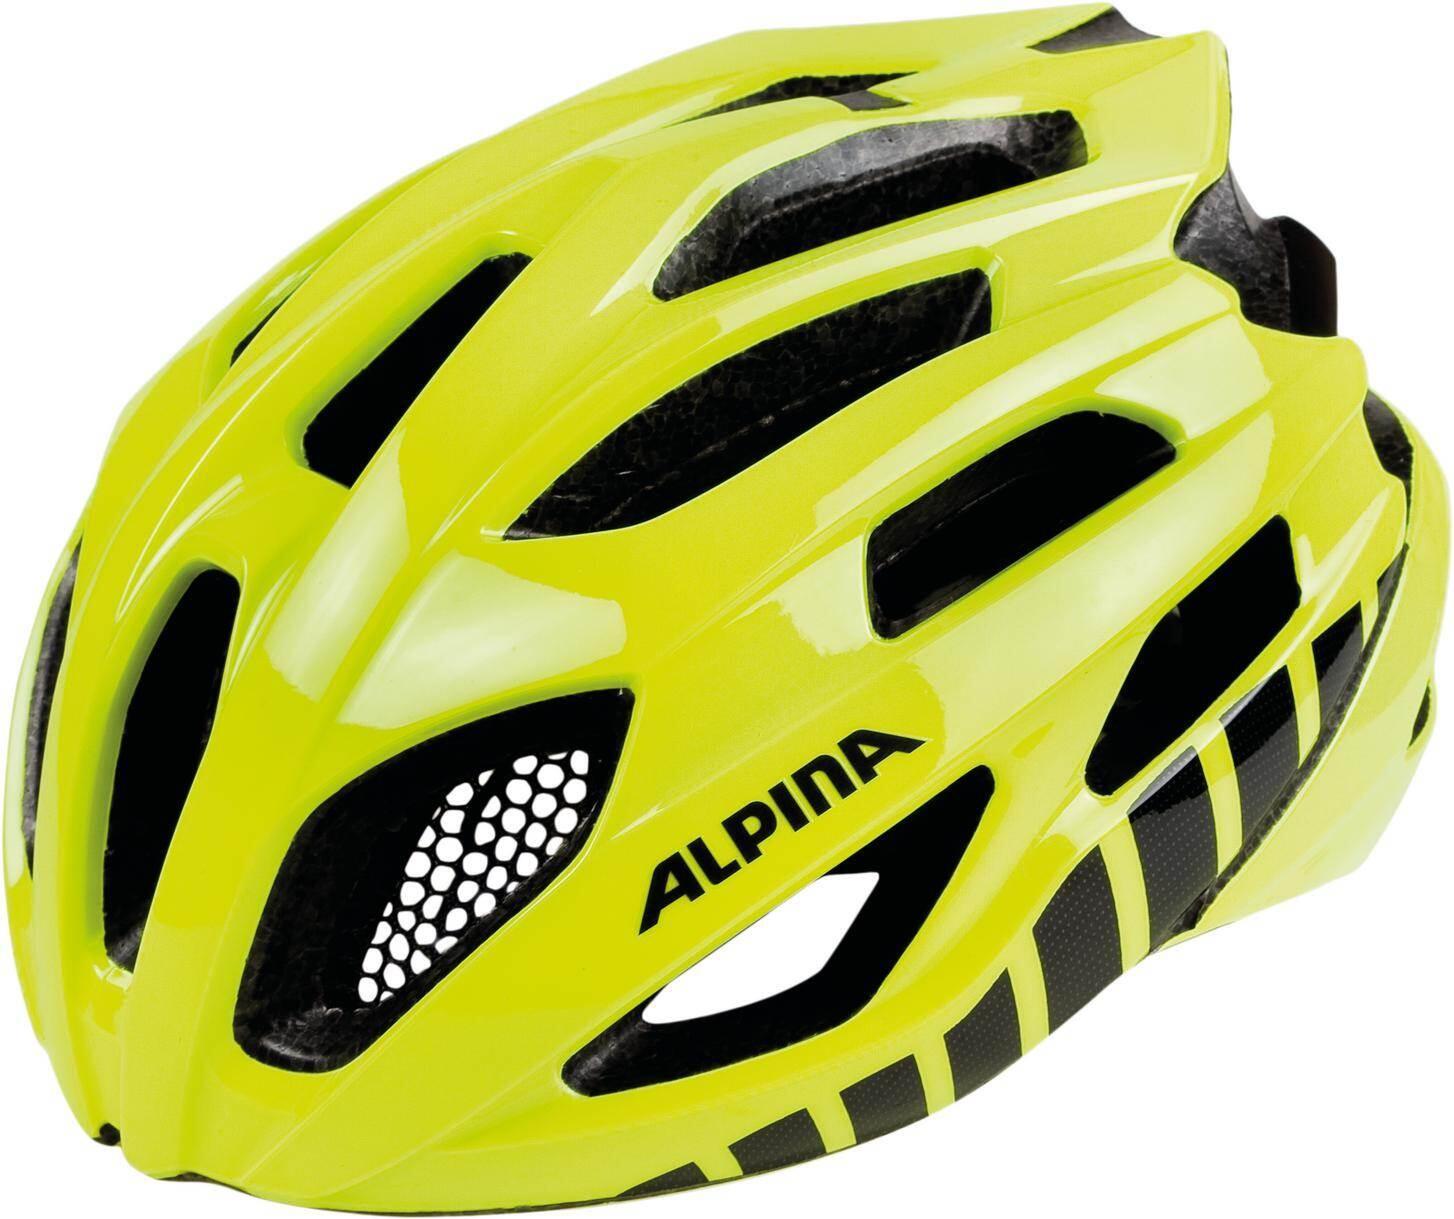 alpina-fedaia-fahrradhelm-gr-ouml-szlig-e-58-63-cm-40-be-visible-